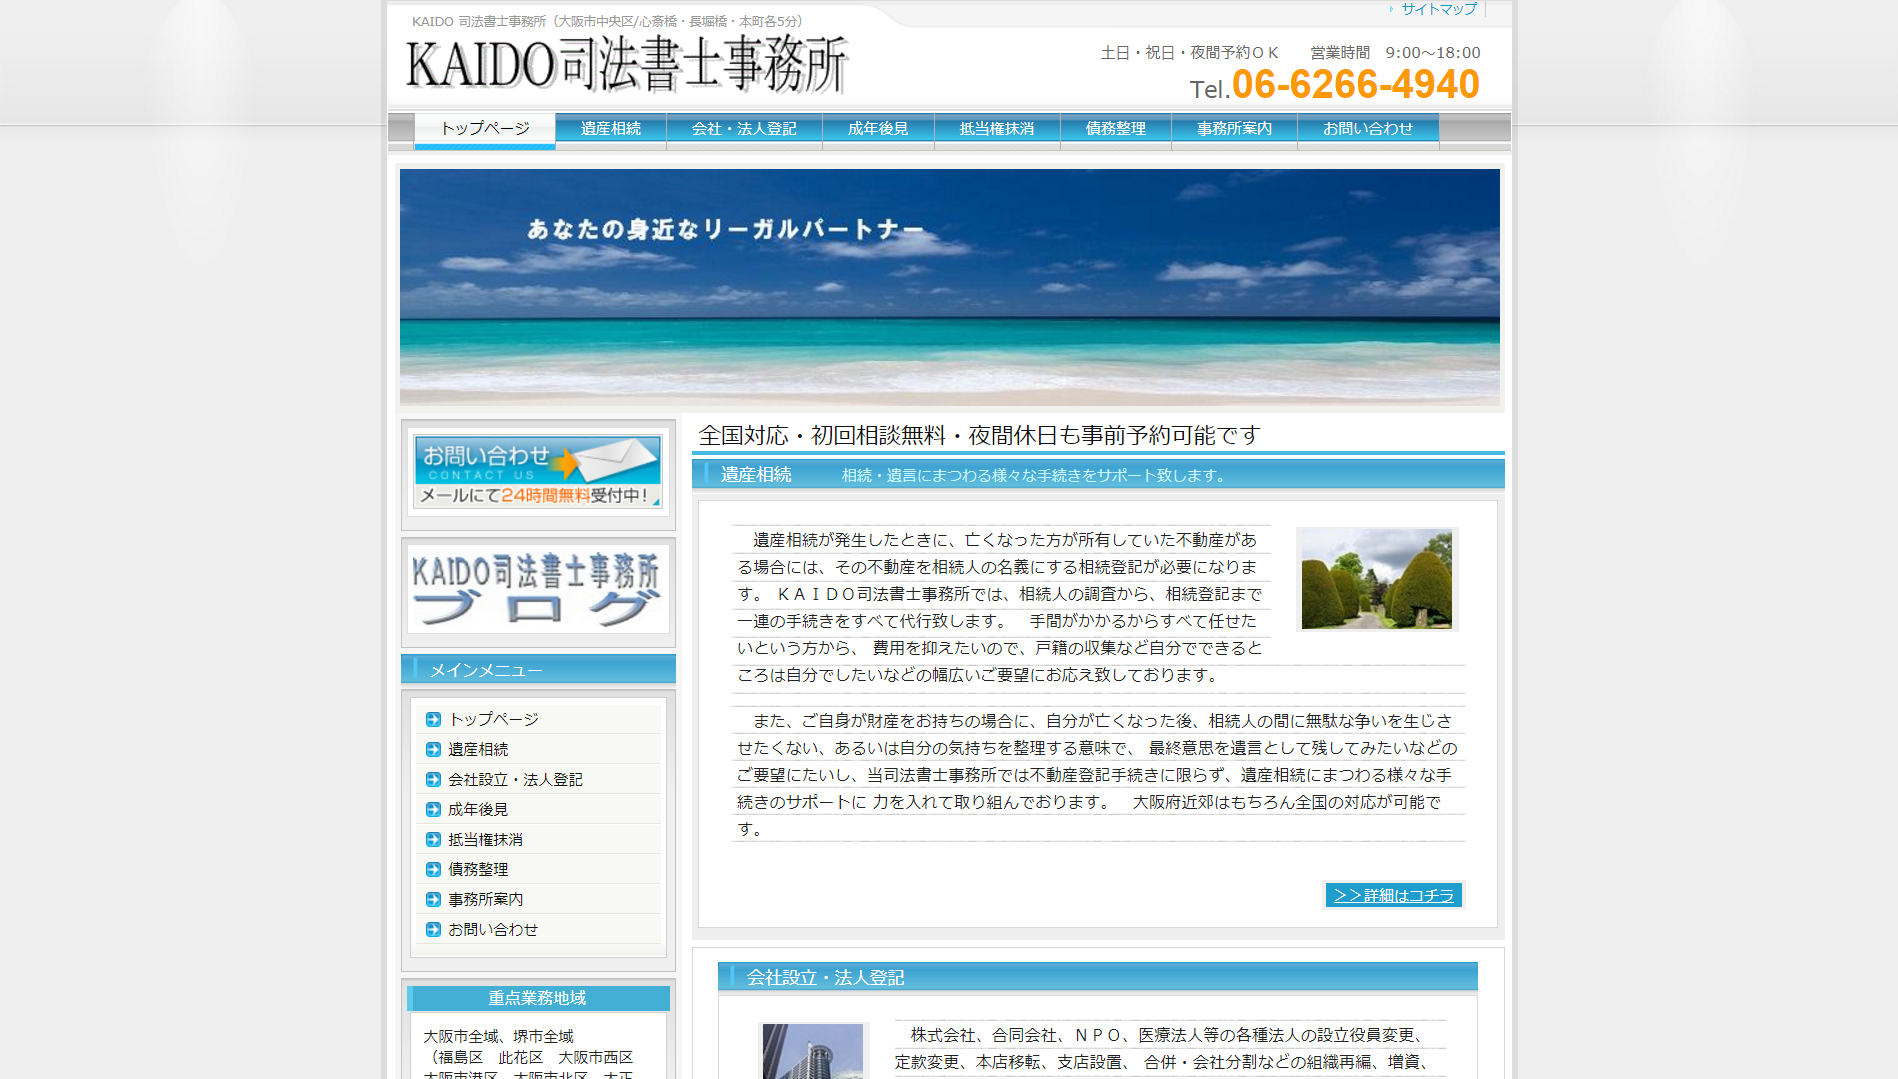 KAIDO司法書士事務所